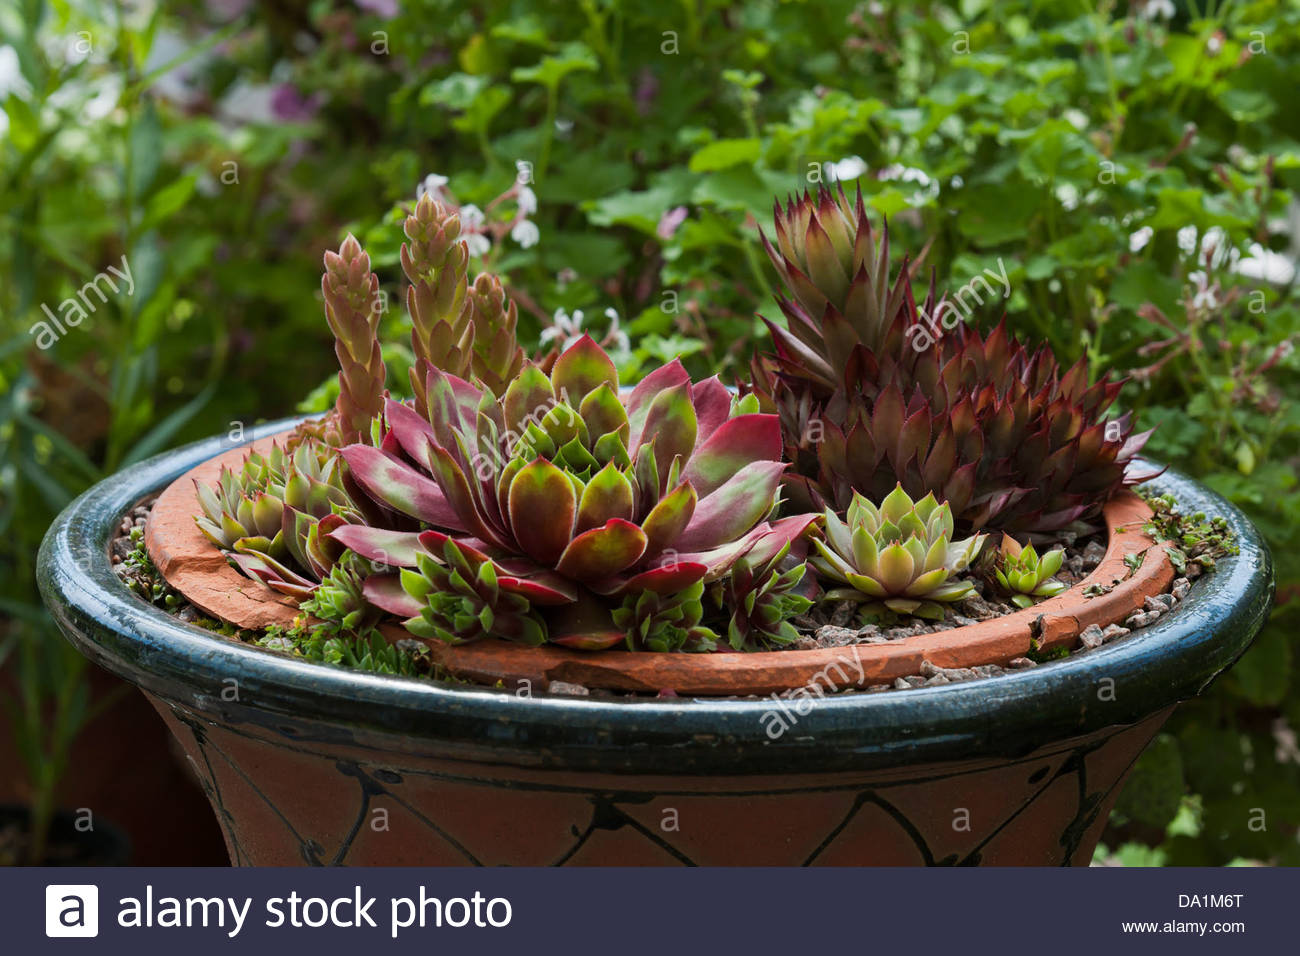 Hauswurz Semperviven Container alpine Matten bilden immergrüne saftige Sommer Juni rote grüne Gartenpflanze Stockbild